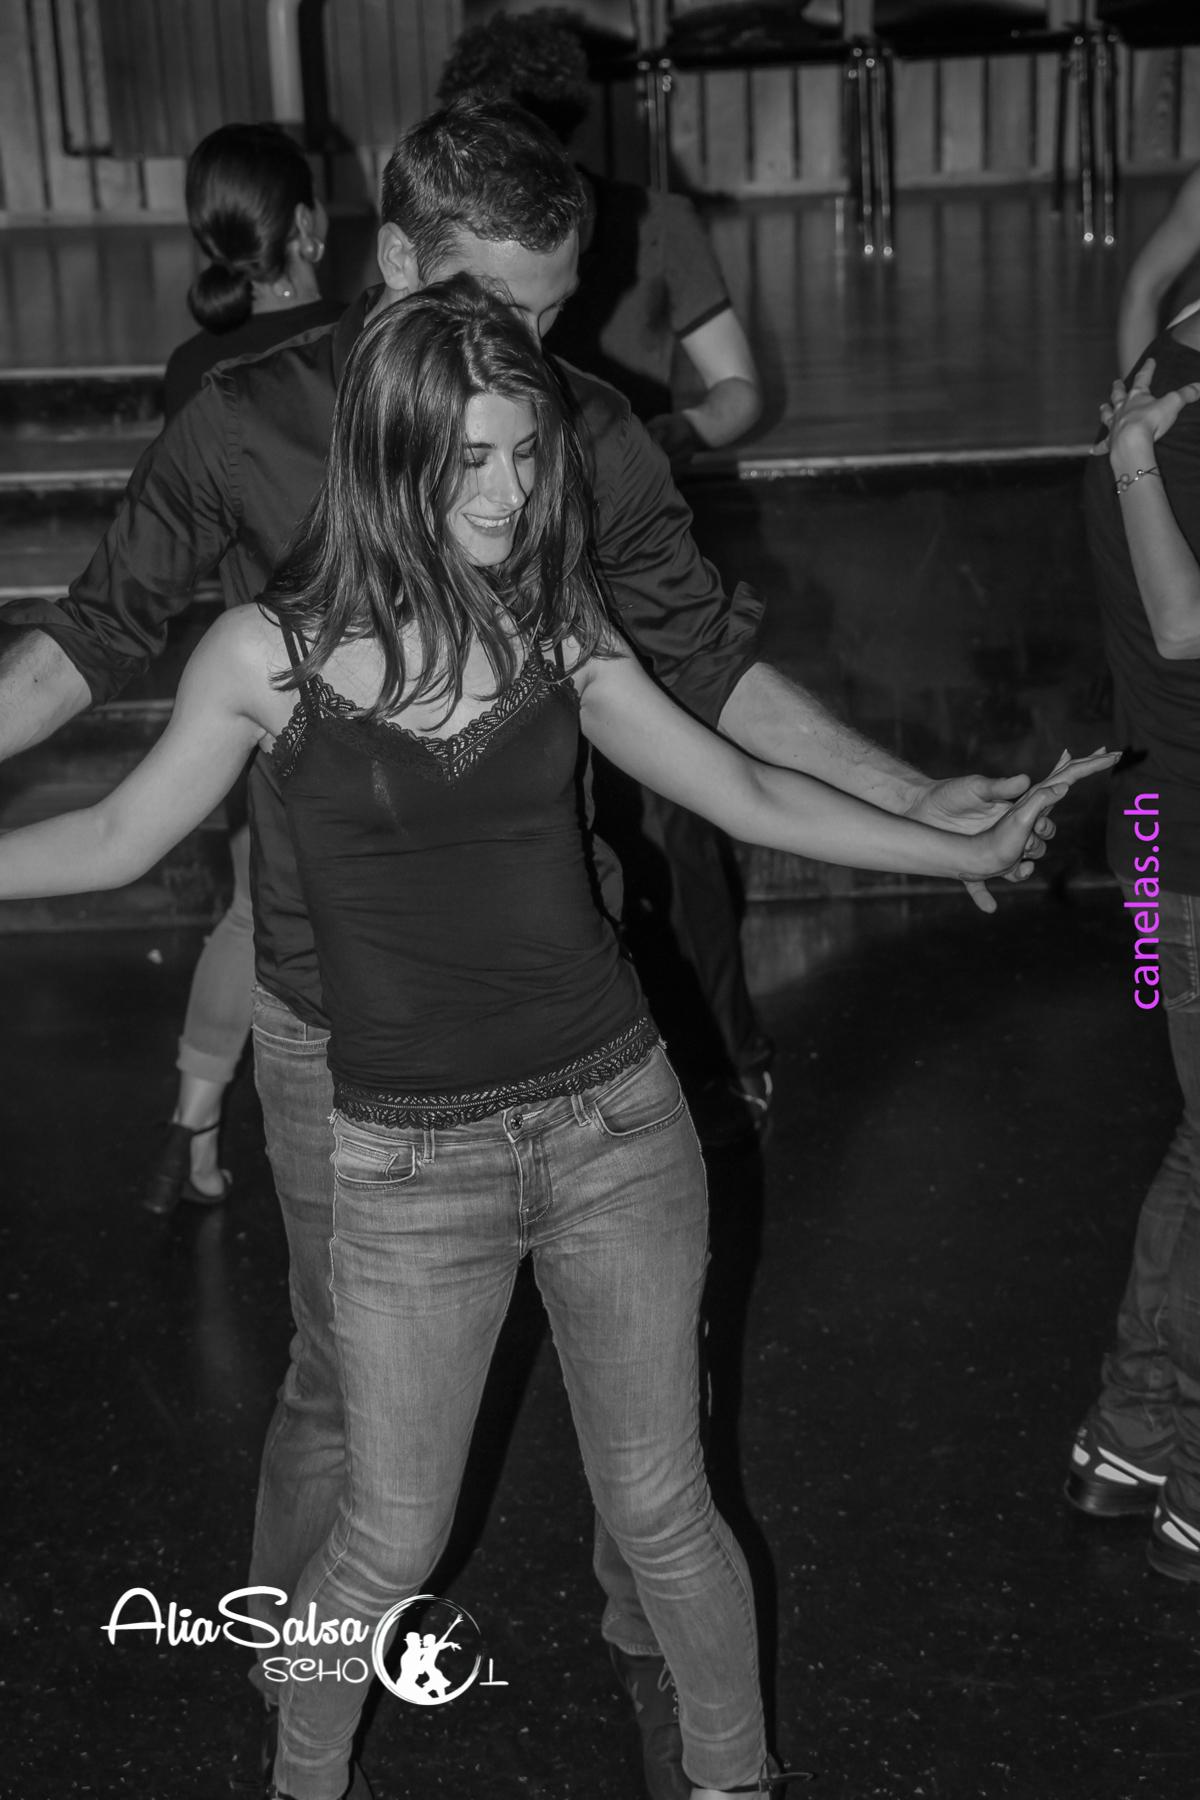 AliaSalsa ecole de danse lausanne soiree bachata salsa cubaineAlia Salsa Soireé Salsa - Bachata-51